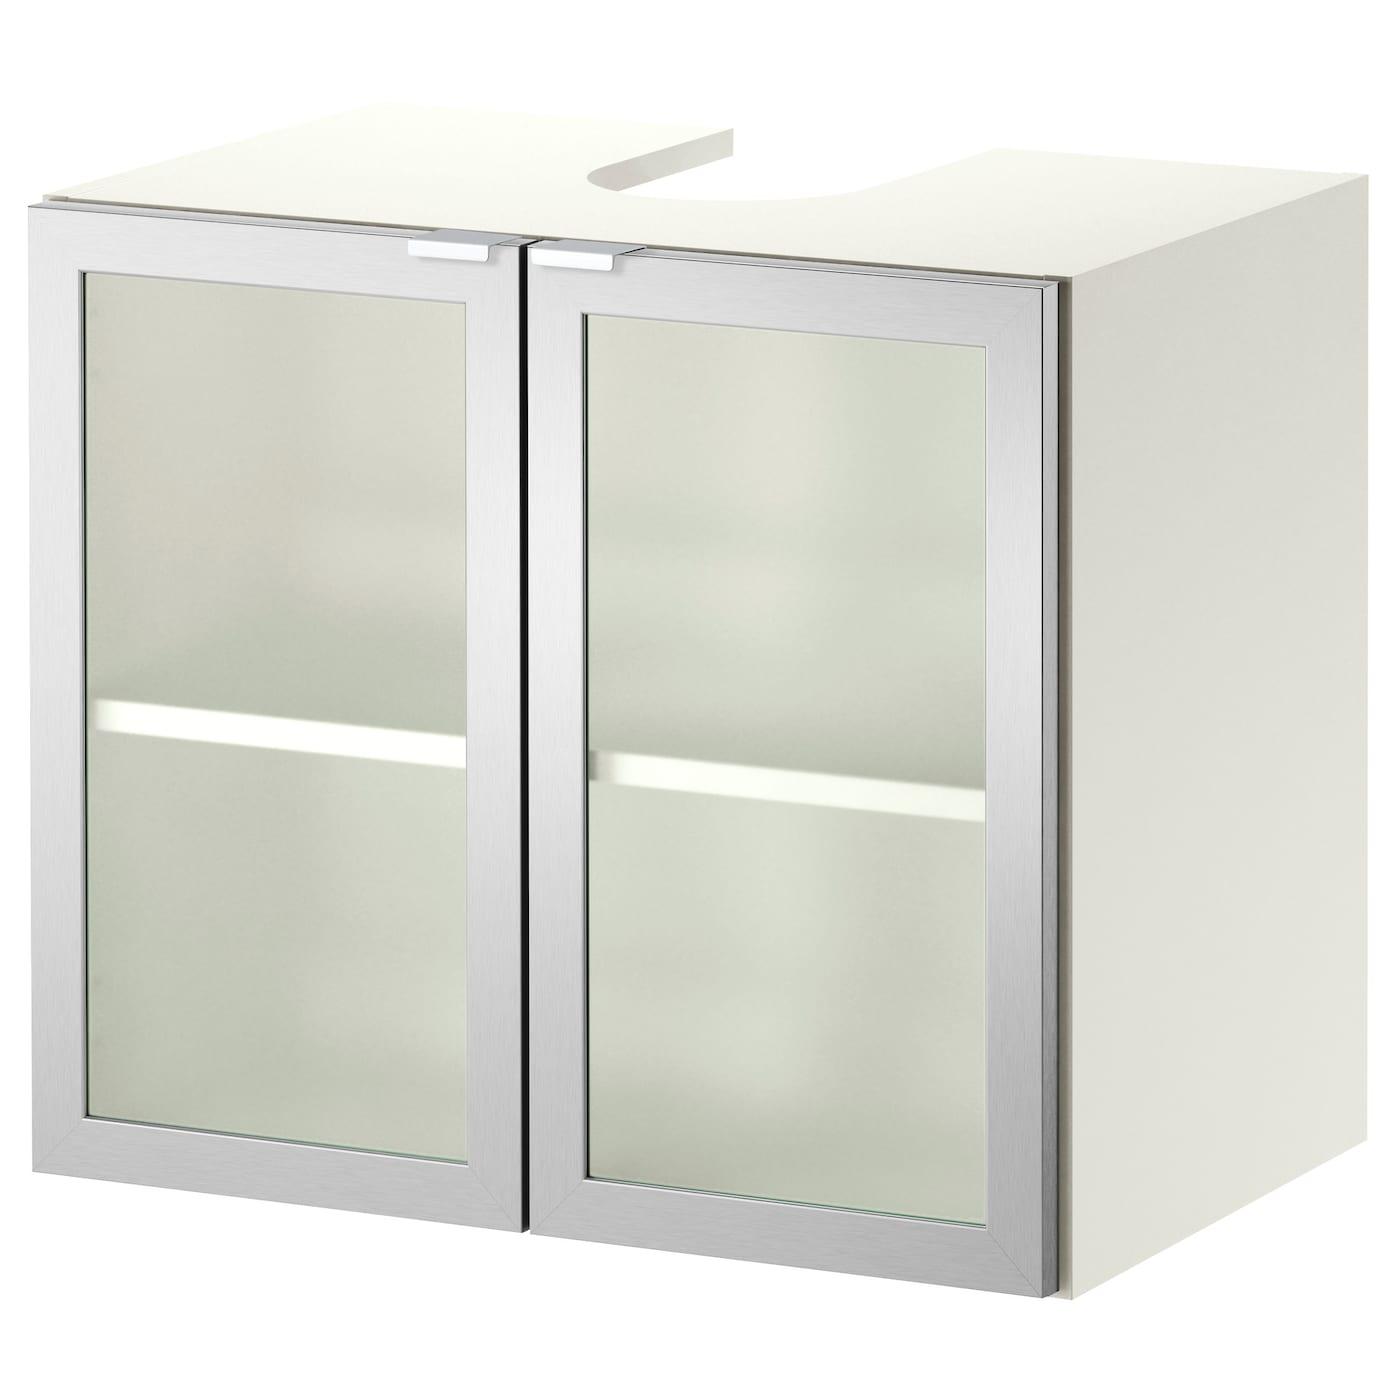 Frosted glass bathroom cabinet doors - Lillngen Washbasin Base Cabinet W 2 Doors Whitealuminium